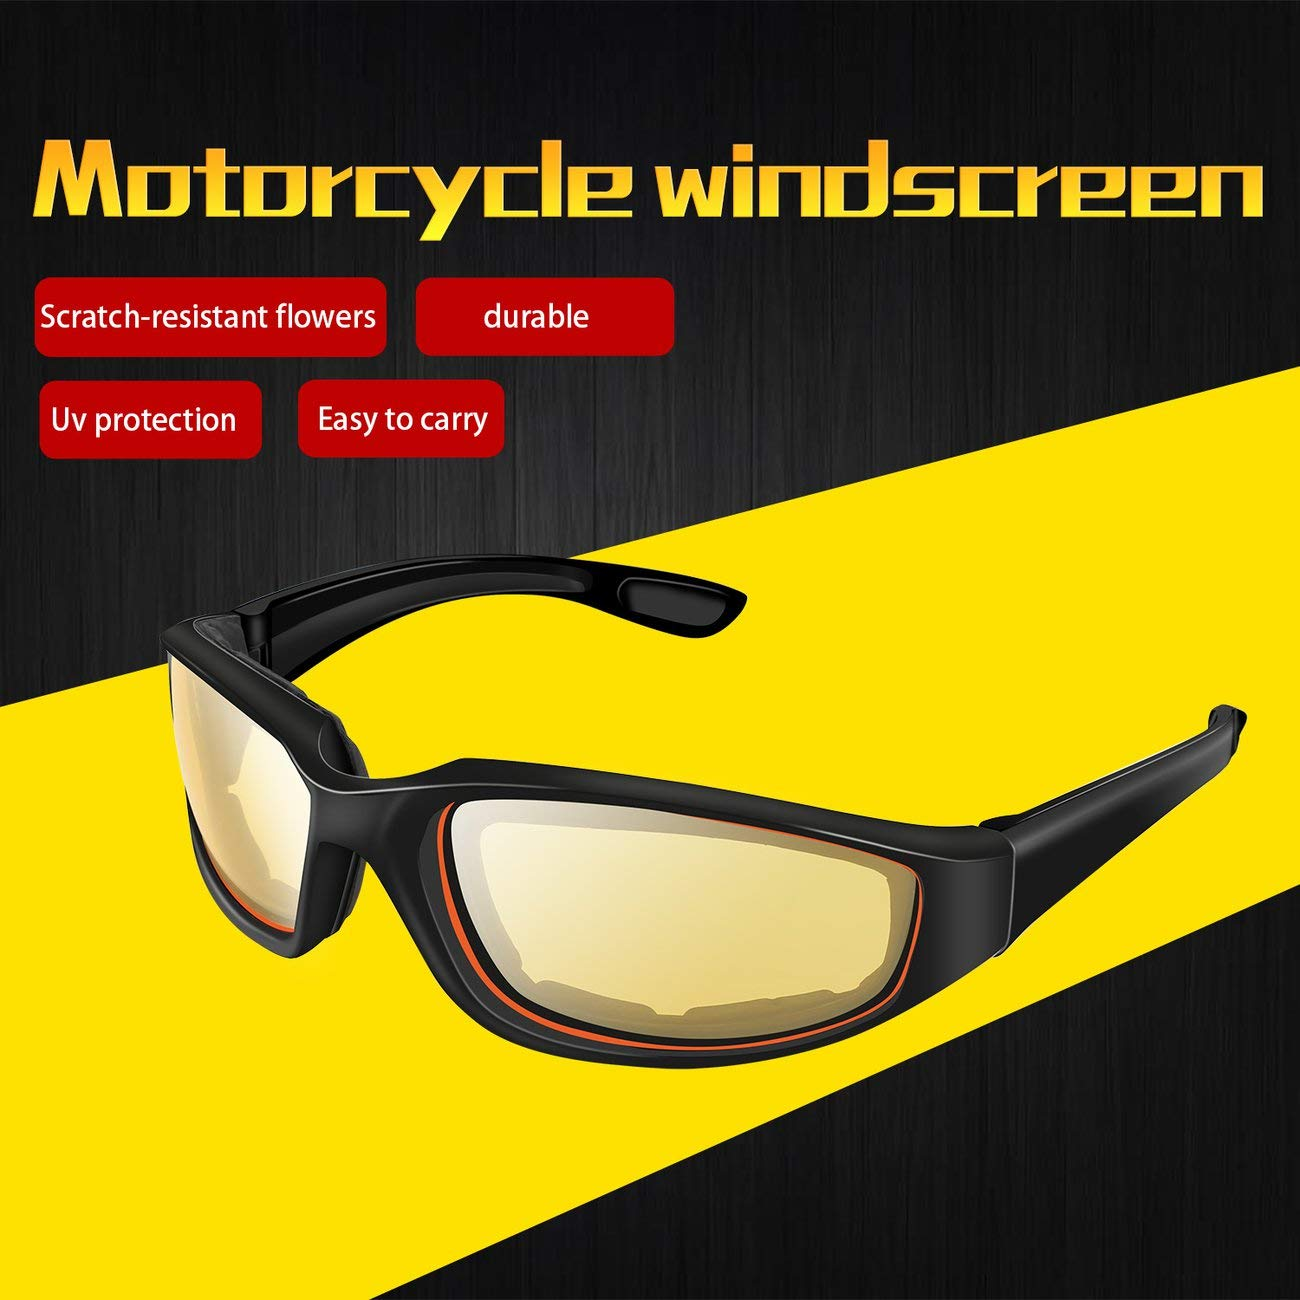 Motorcycle Protective Glasses Windproof Dustproof Eye Glasses Cycling Eyeglasses Outdoor Sports Eyewear Glasses